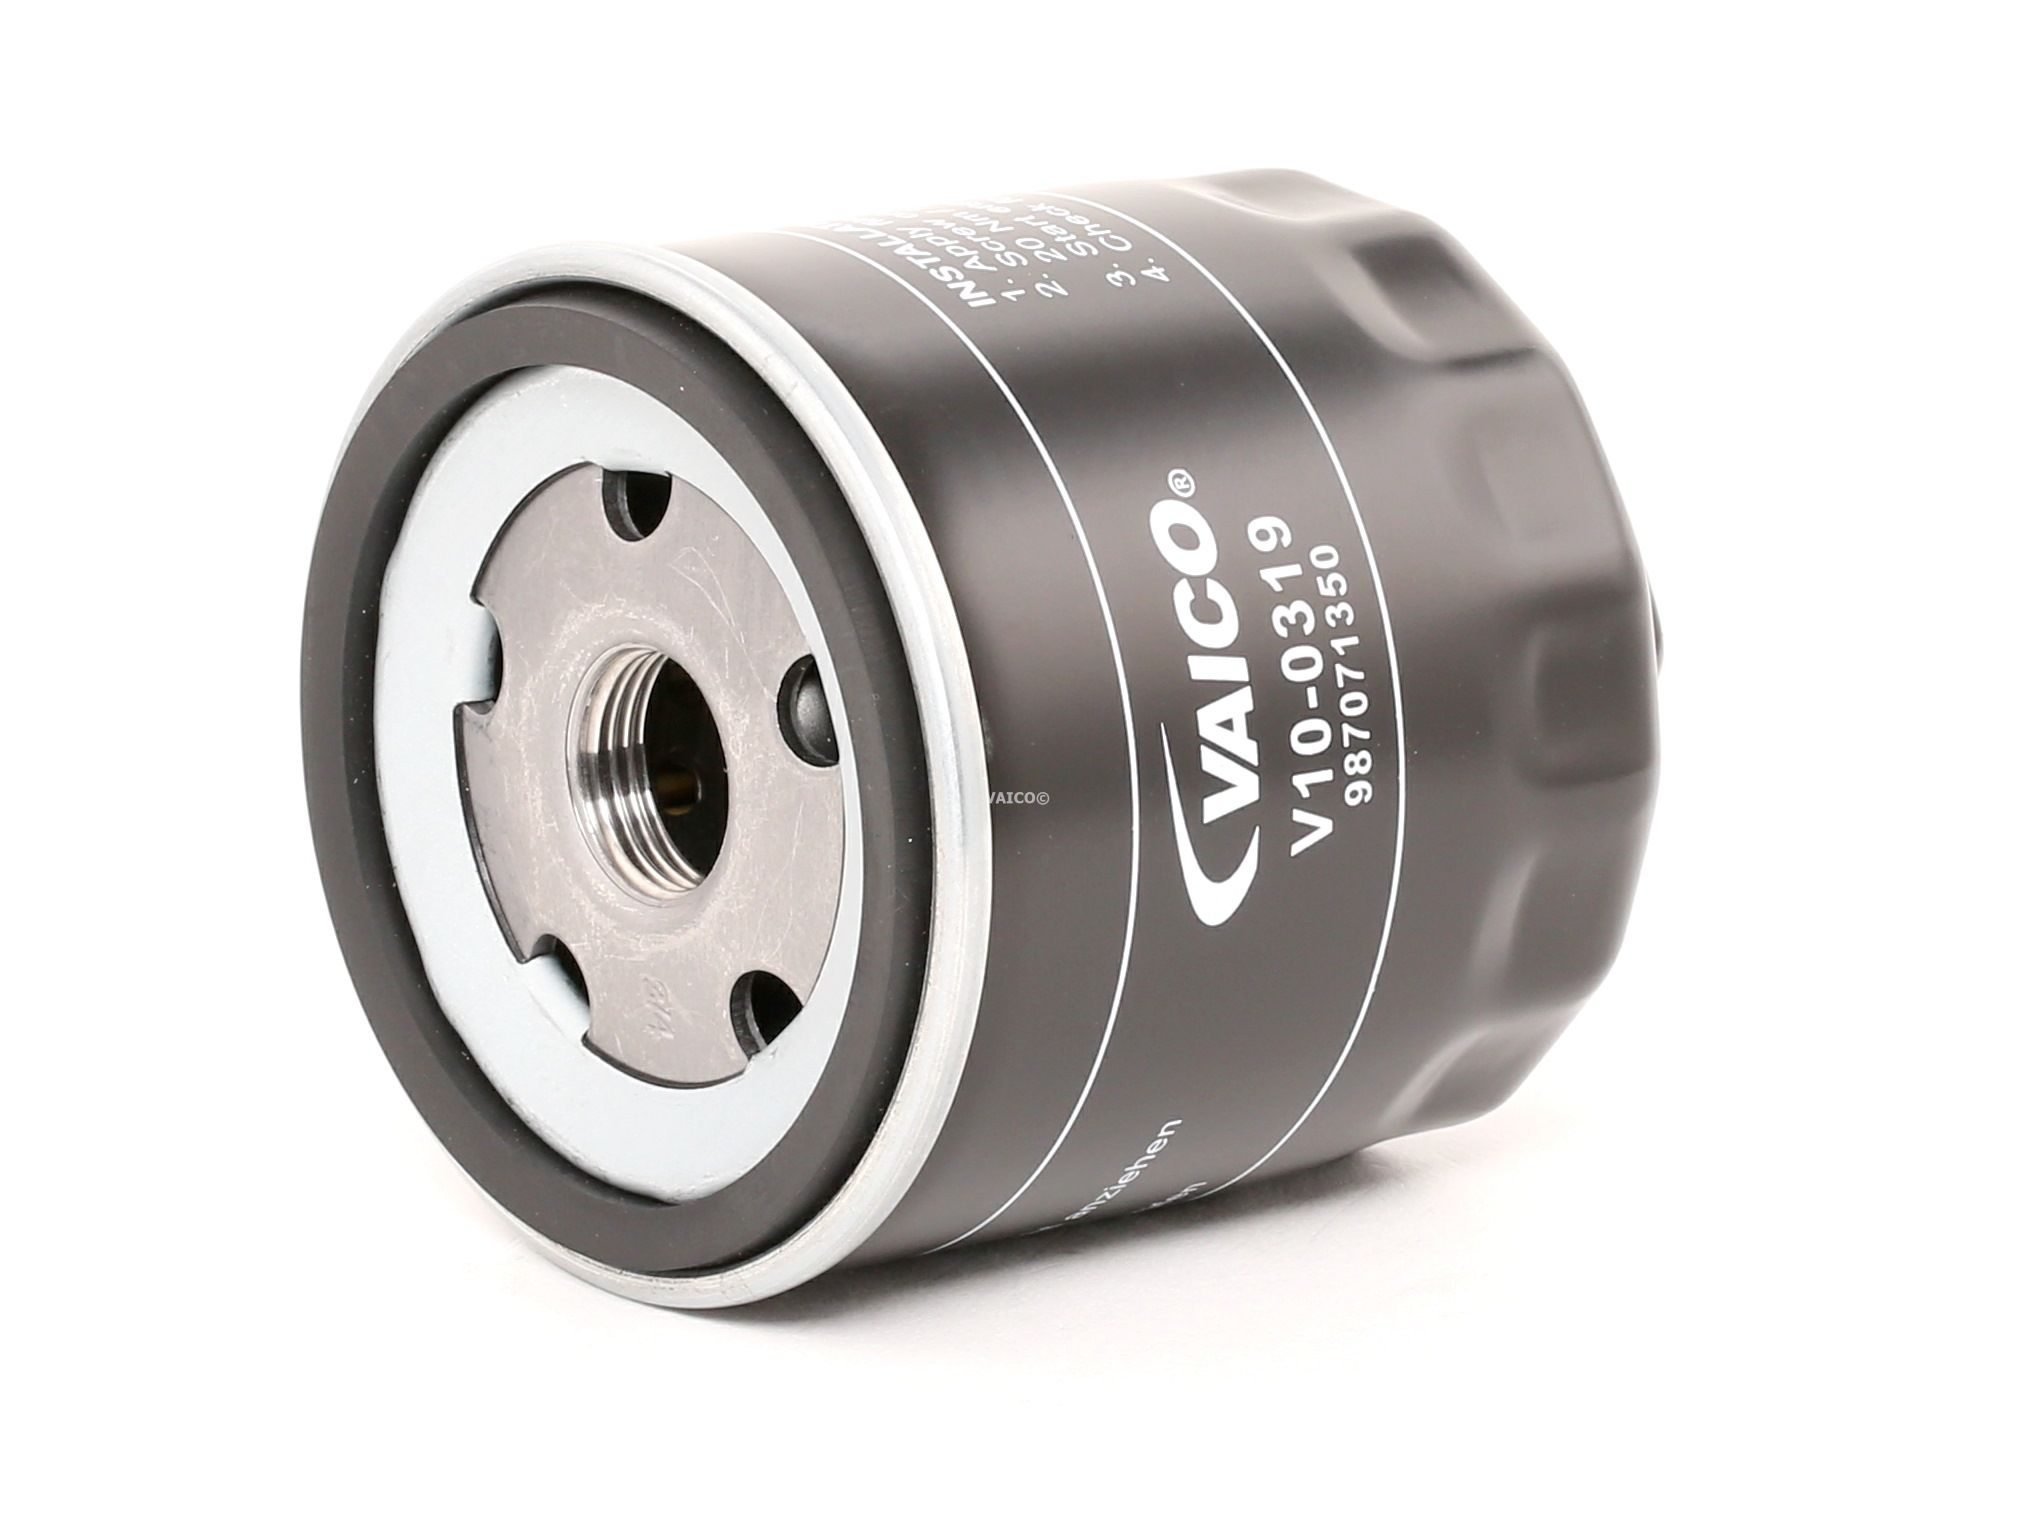 V10-0319 VAICO Anschraubfilter, mit einem Rücklaufsperrventil, Original VAICO Qualität Innendurchmesser 2: 62mm, Innendurchmesser 2: 71mm, Ø: 76mm, Ø: 80mm, Höhe: 79mm Ölfilter V10-0319 günstig kaufen